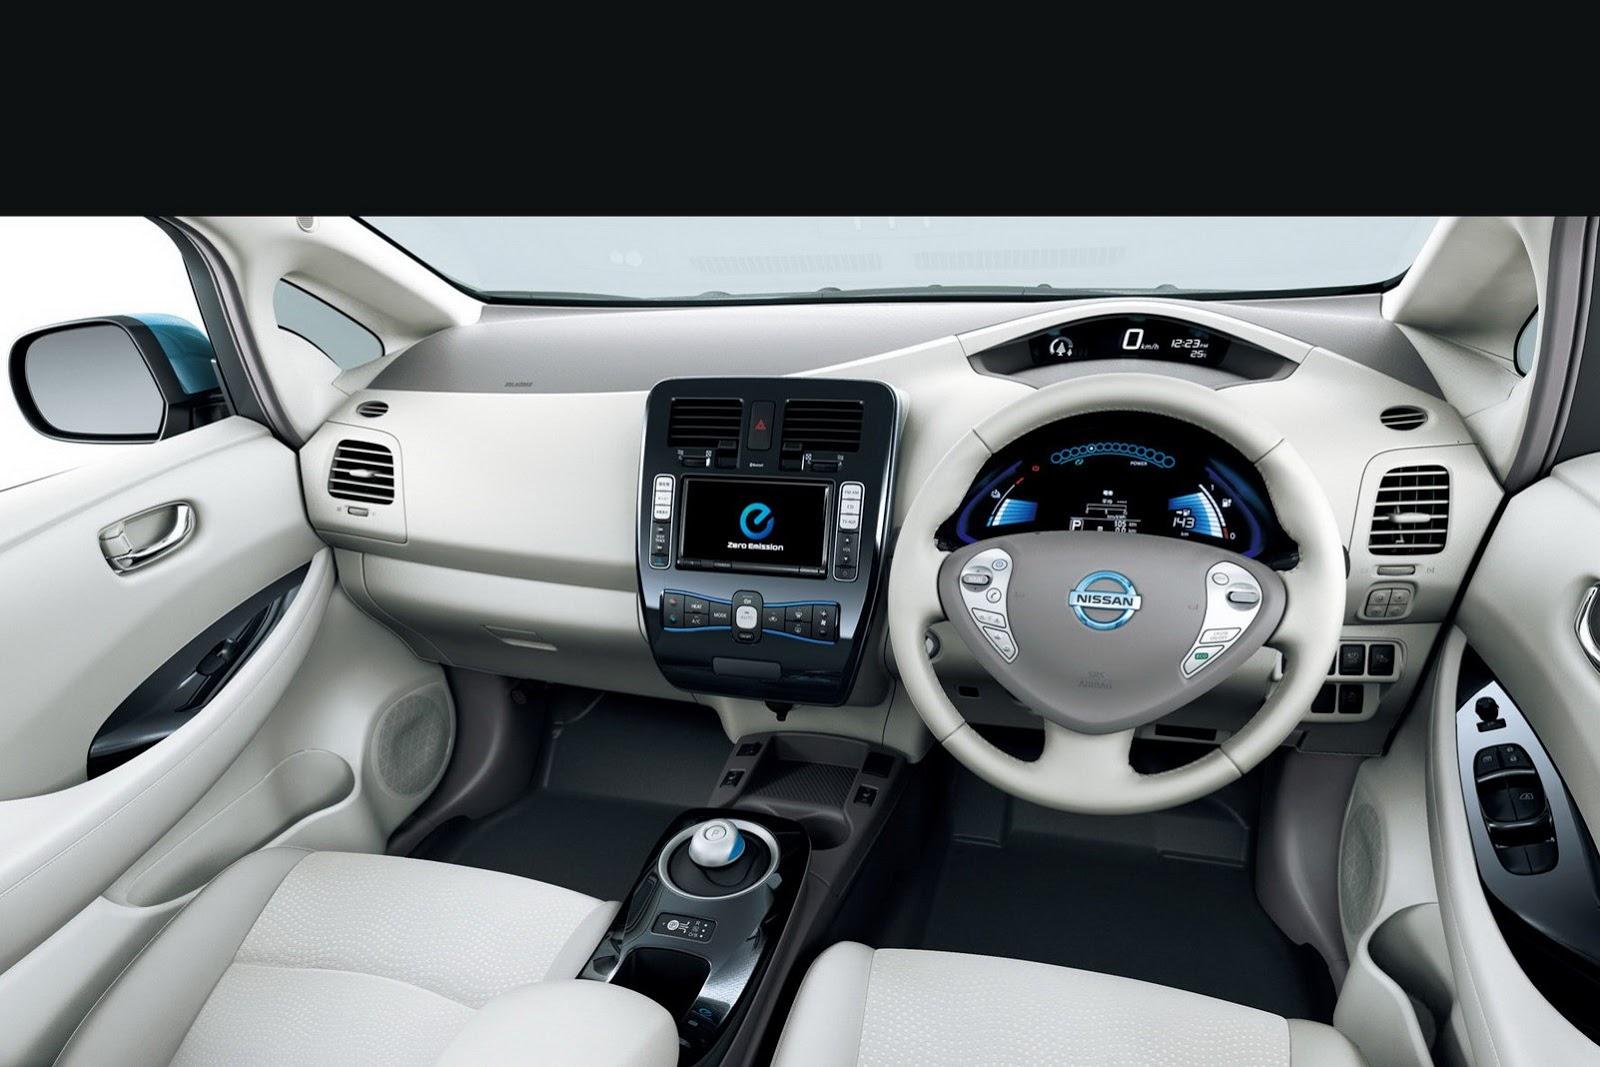 2013-Nissan-Leaf-29%25255B2%25255D.jpg